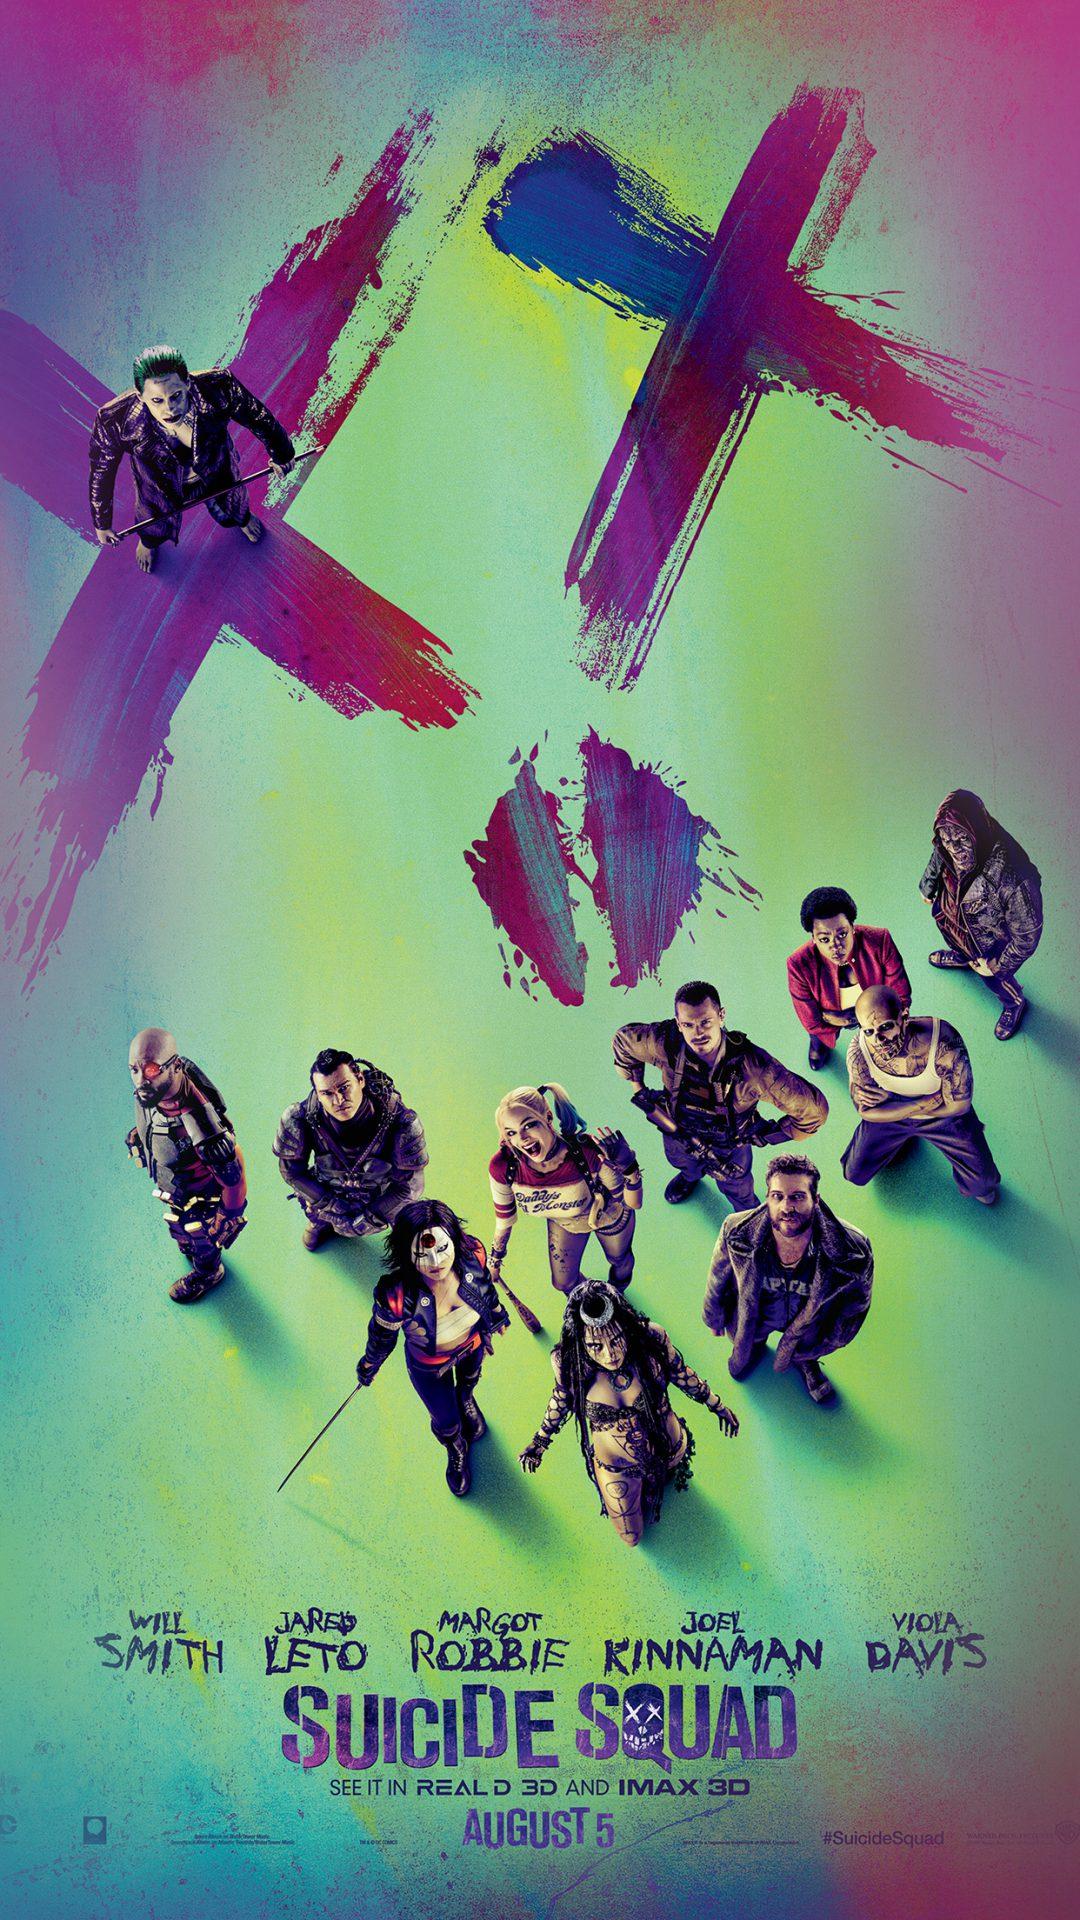 Suicide Squad Poster Film Colorful Art Illustration